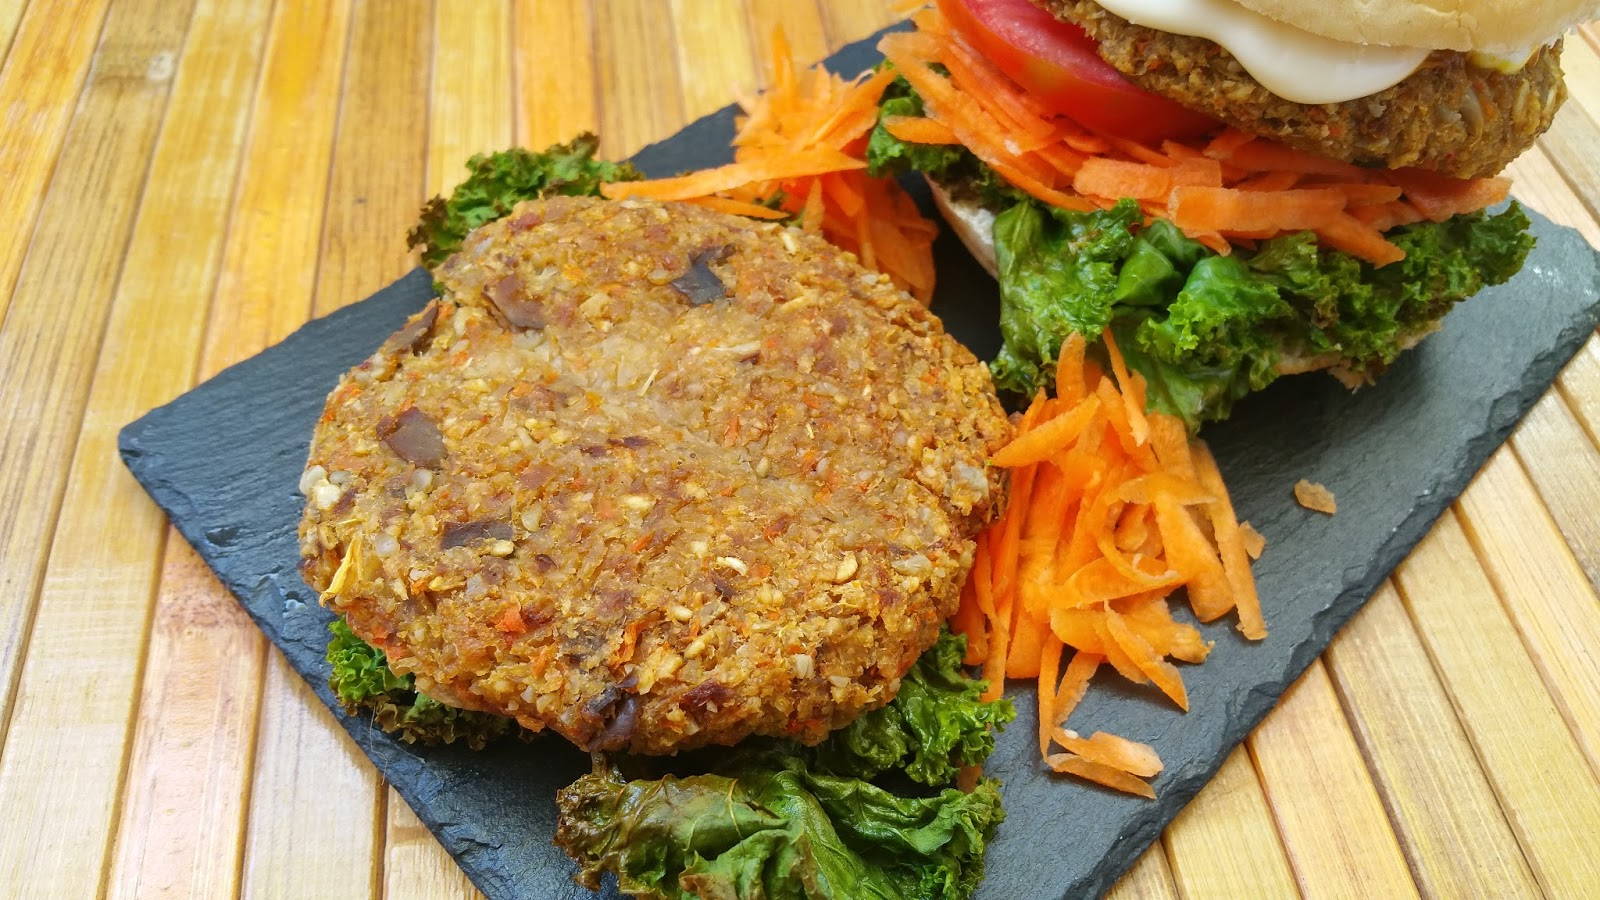 Vegspiration blog de inspiraci n vegana hamburguesas de - Calorias alubias cocidas ...